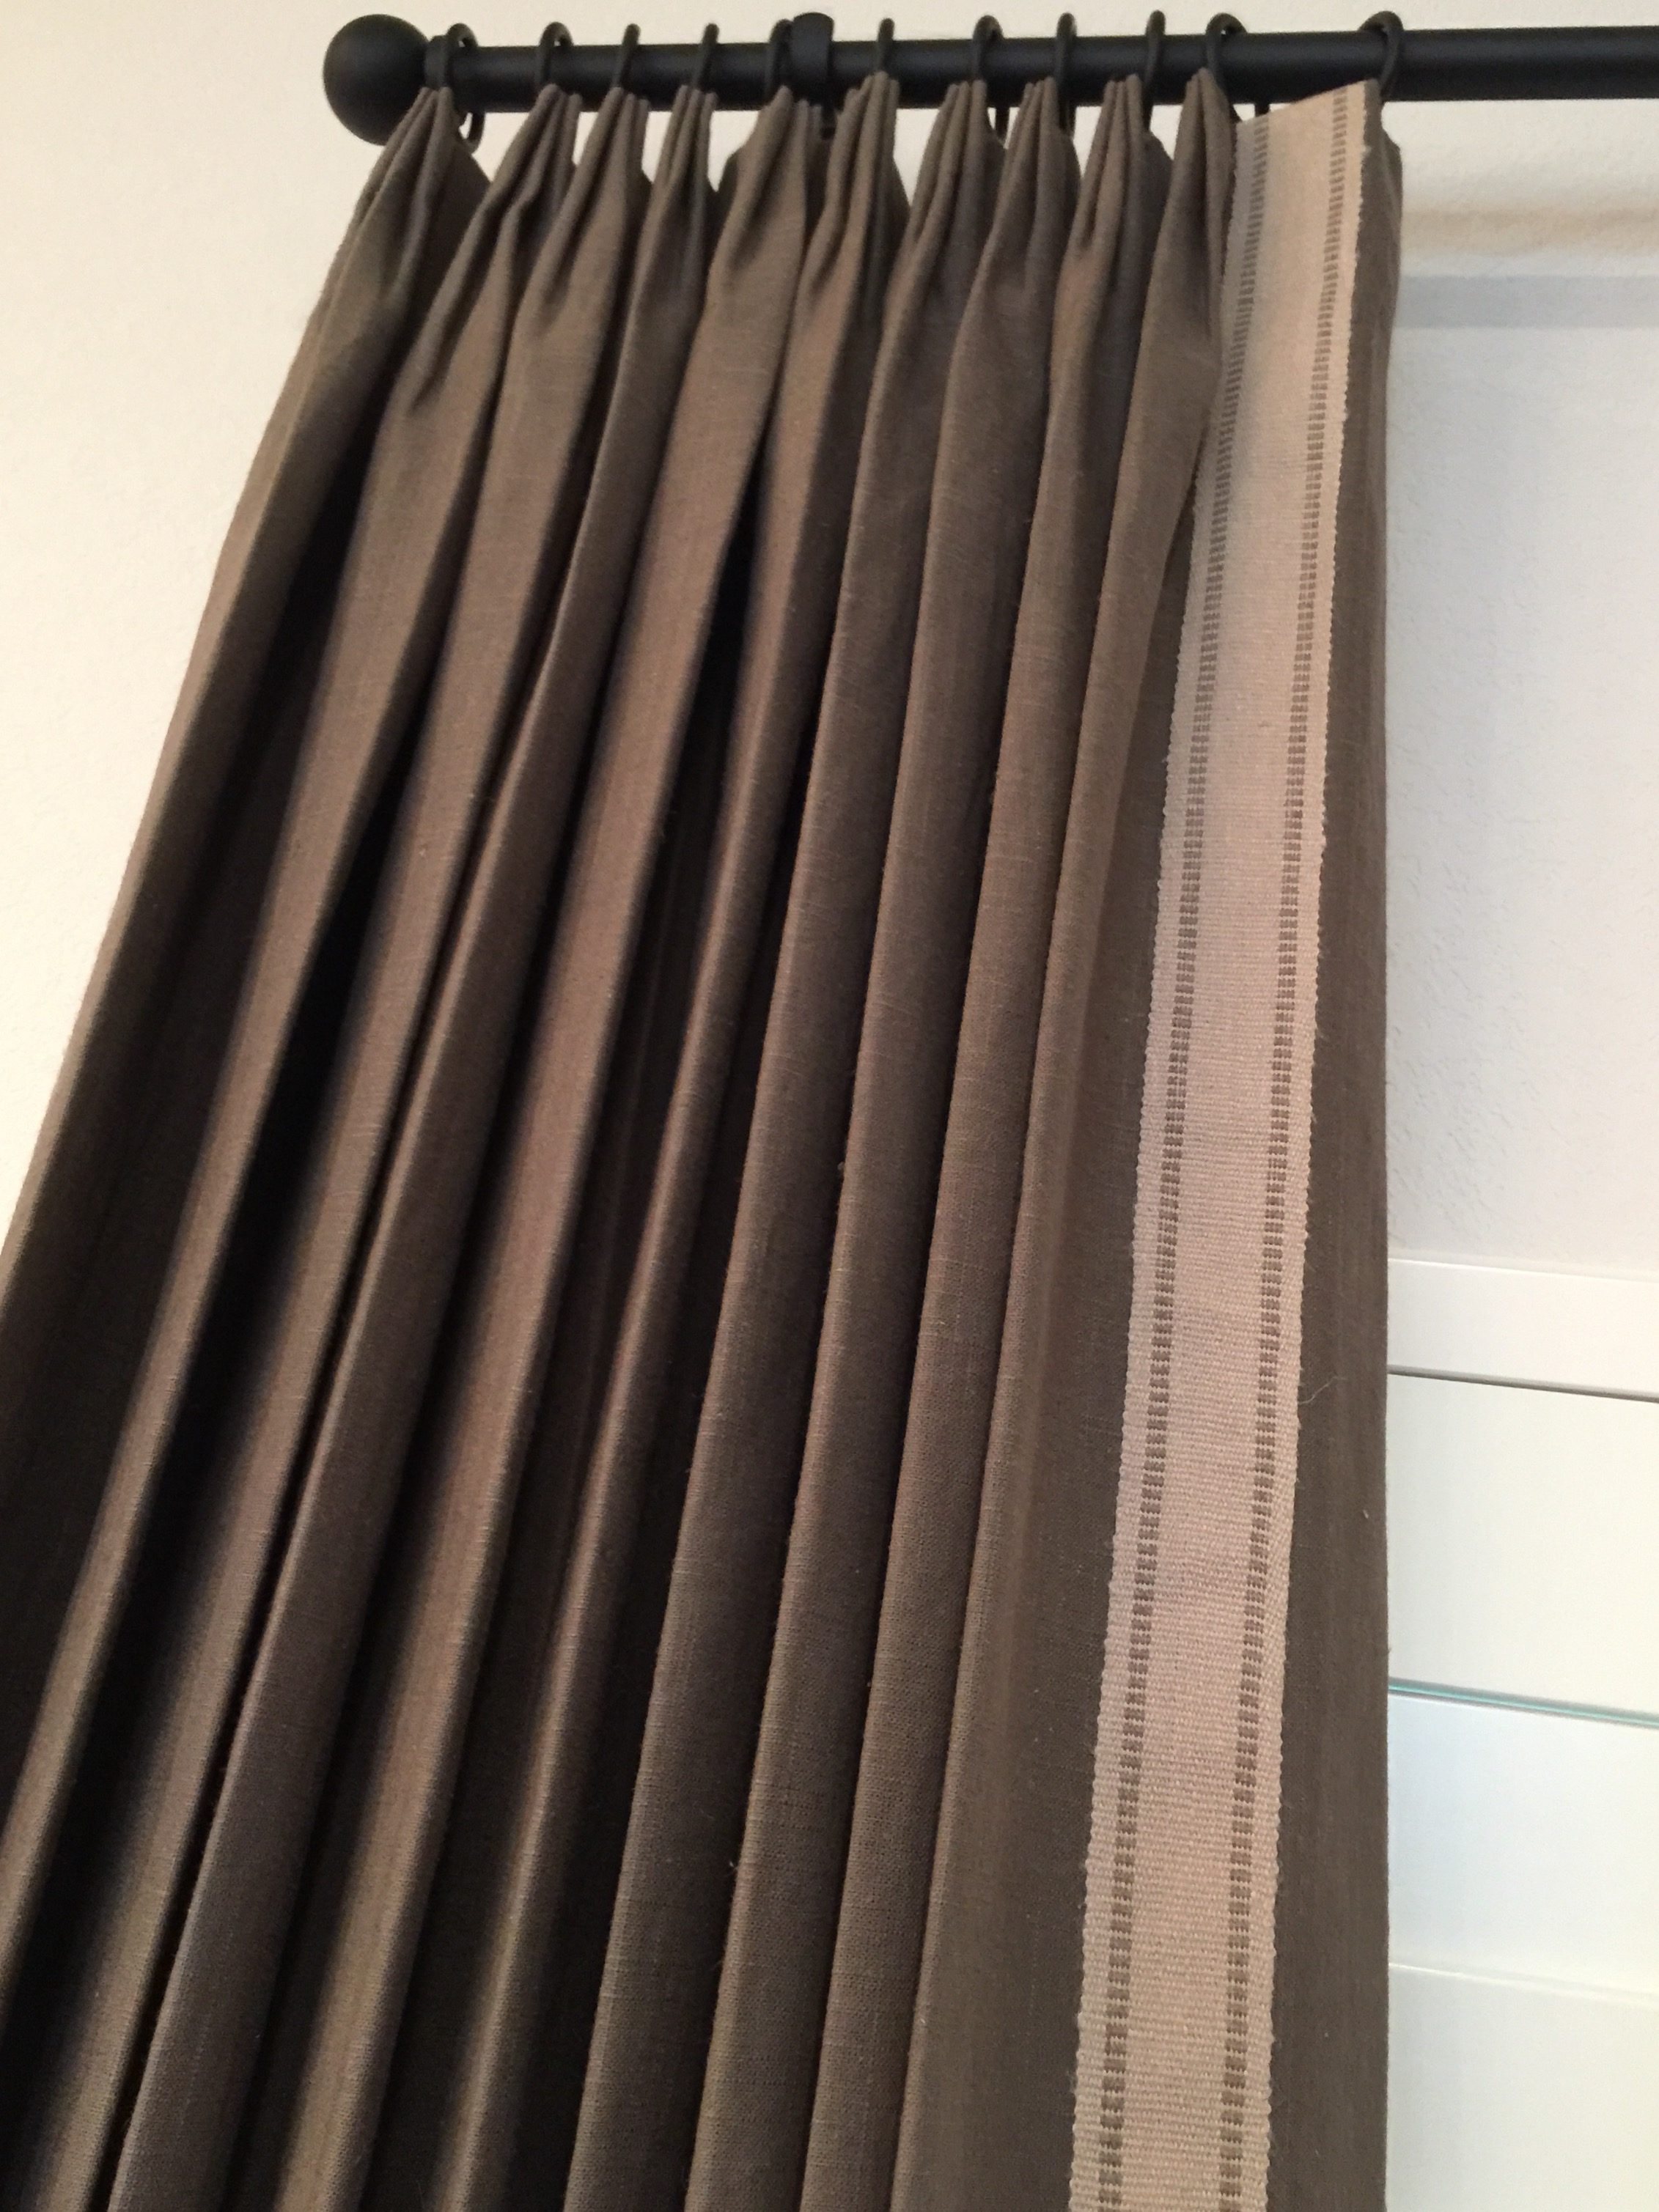 Window treatment with tape trim on leading edge of drapery |  Carla Aston, Designer #windowtreatment #tapetrim #drapery